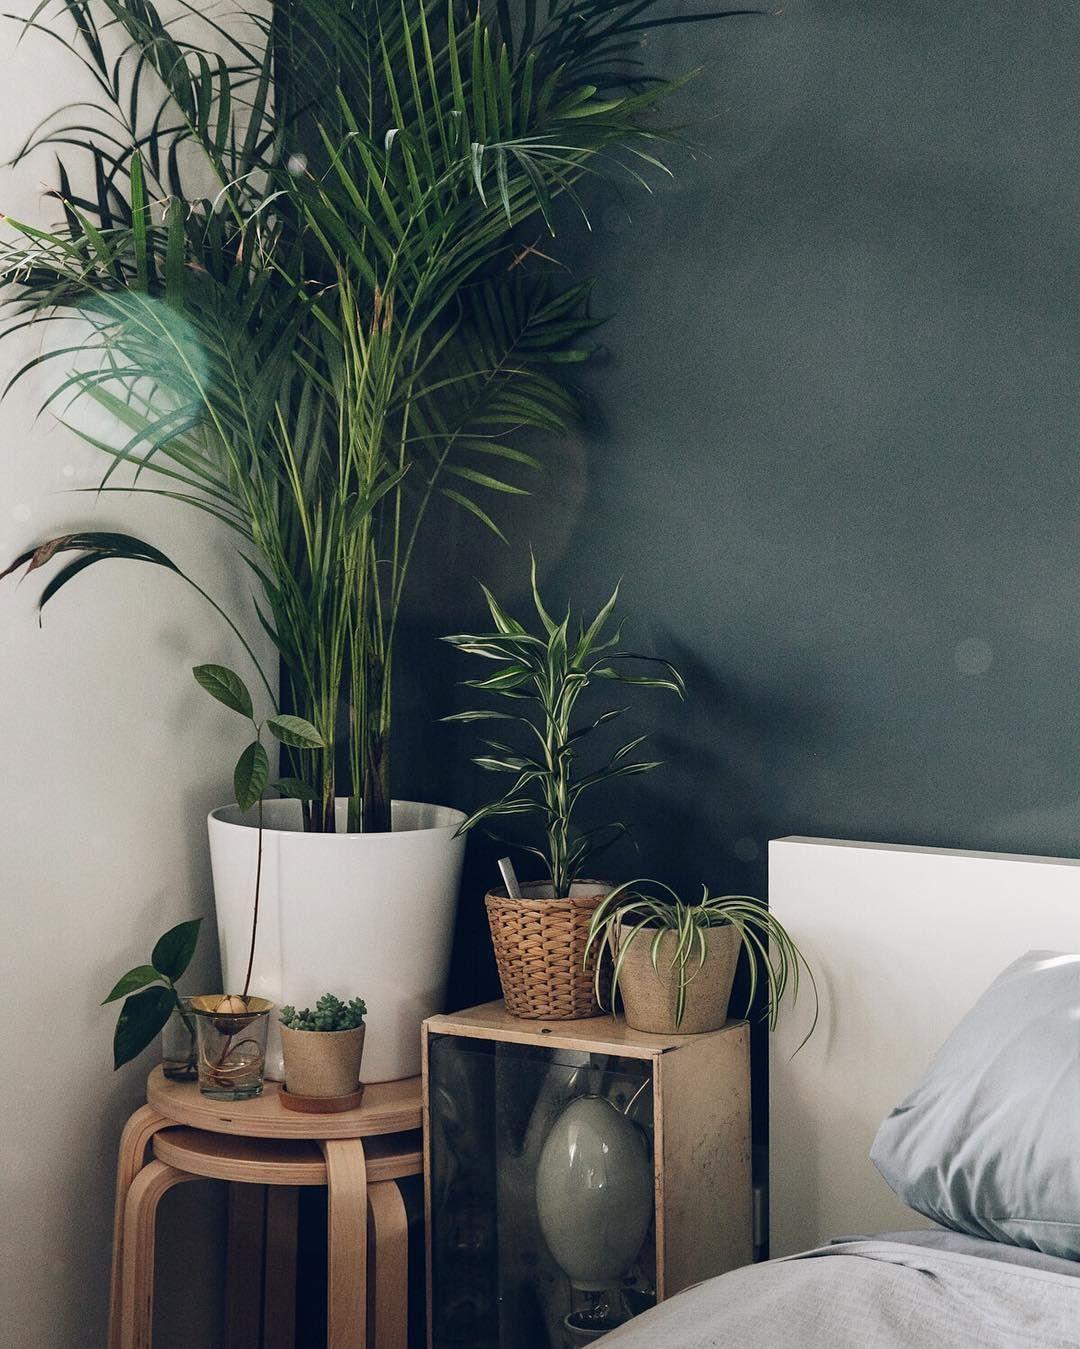 Bedside plants - Haarkon / India & Magnus (@haarkon_) • Instagram ...